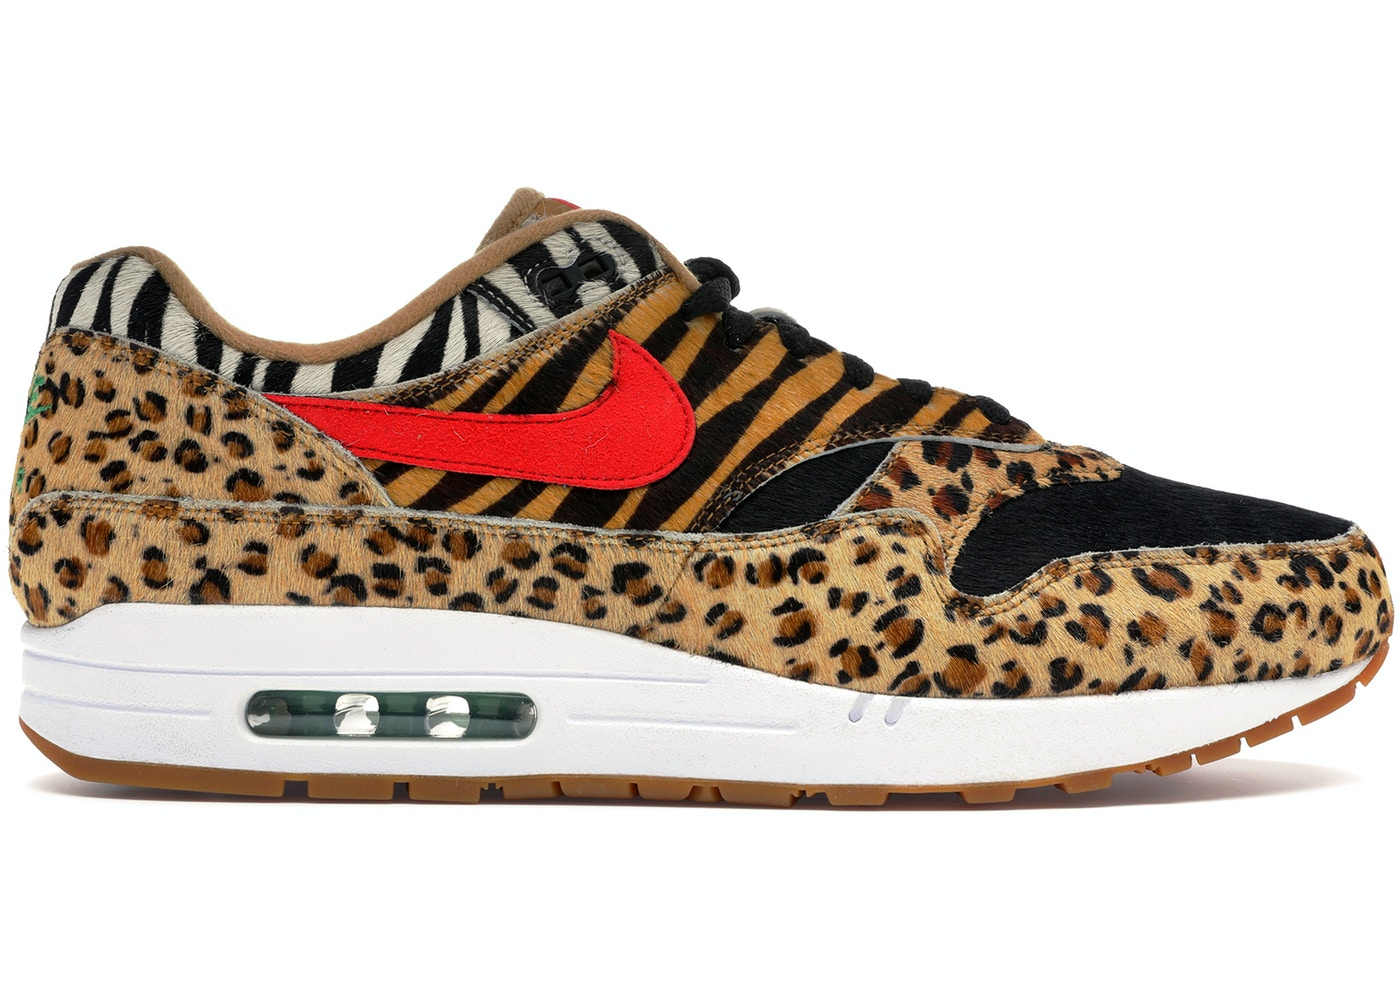 best sneakers eb9c4 a7612 Air Max 1 Atmos Animal Pack 2.0 (2018 Animal Print Box) - AQ0928-700